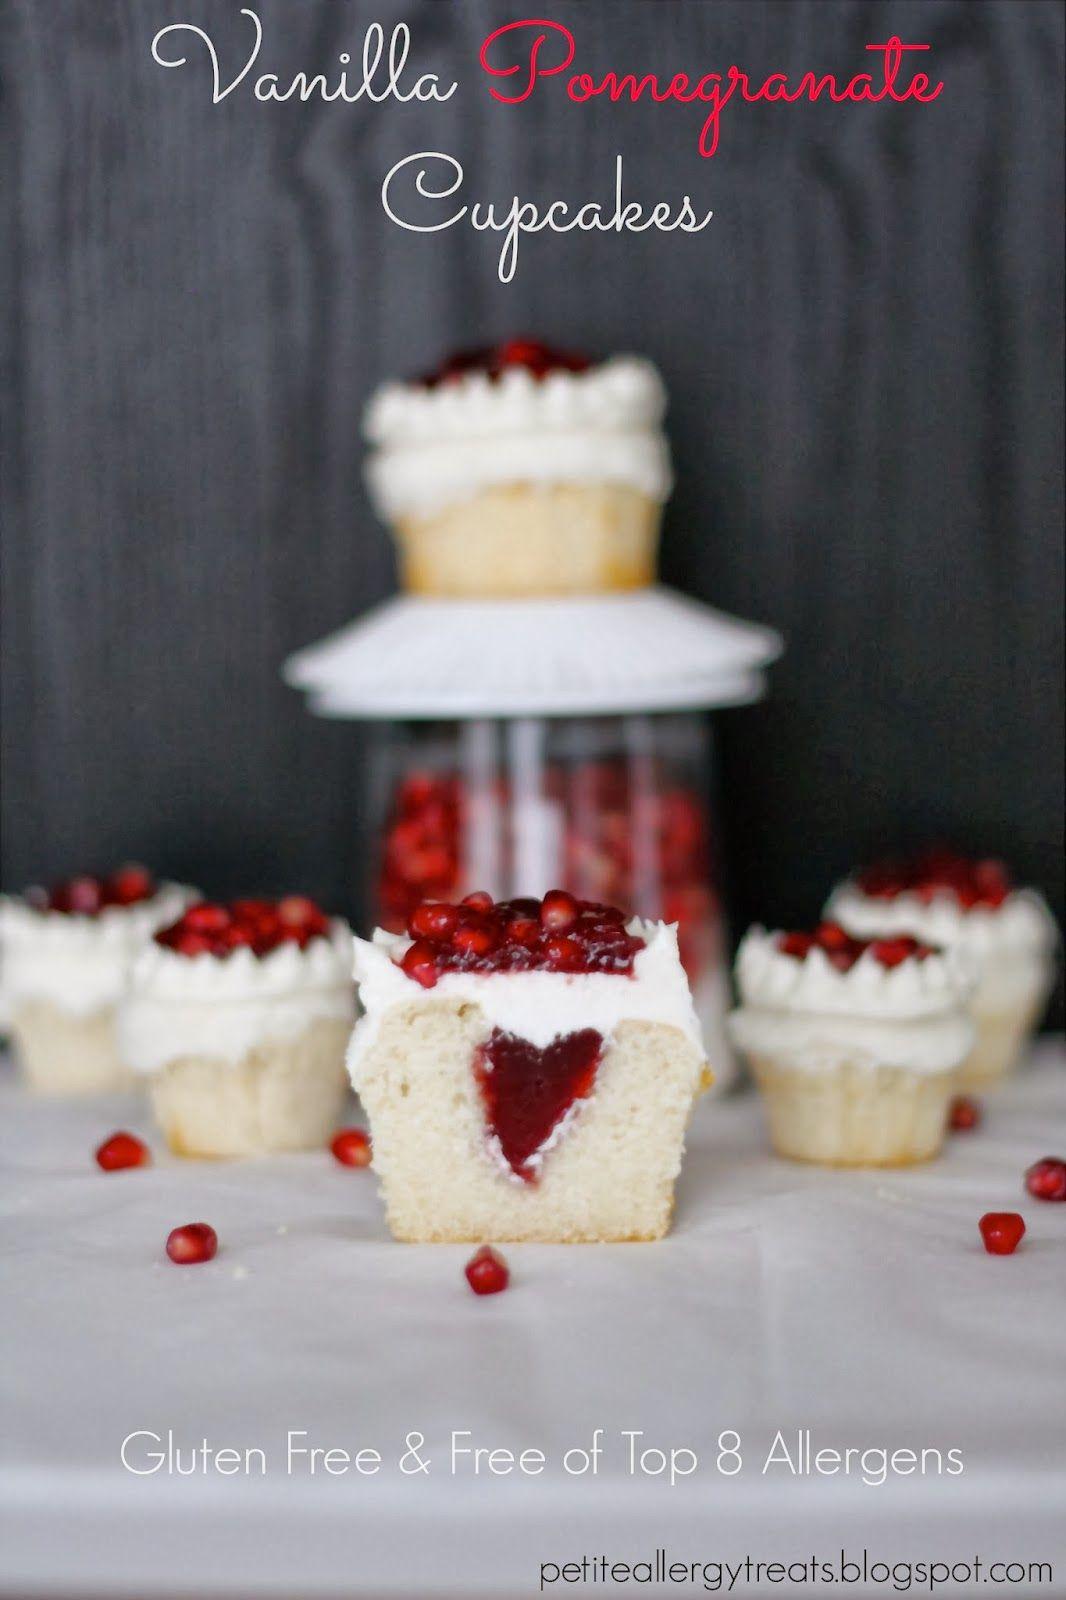 Gluten Free Pomegranate Cupcakes-petiteallergytreats.blogspot.com  #glutenfree, #Pomegrante, #vanilla, #eggless, #dairyfree, #caseinfree, #dessert, #cake